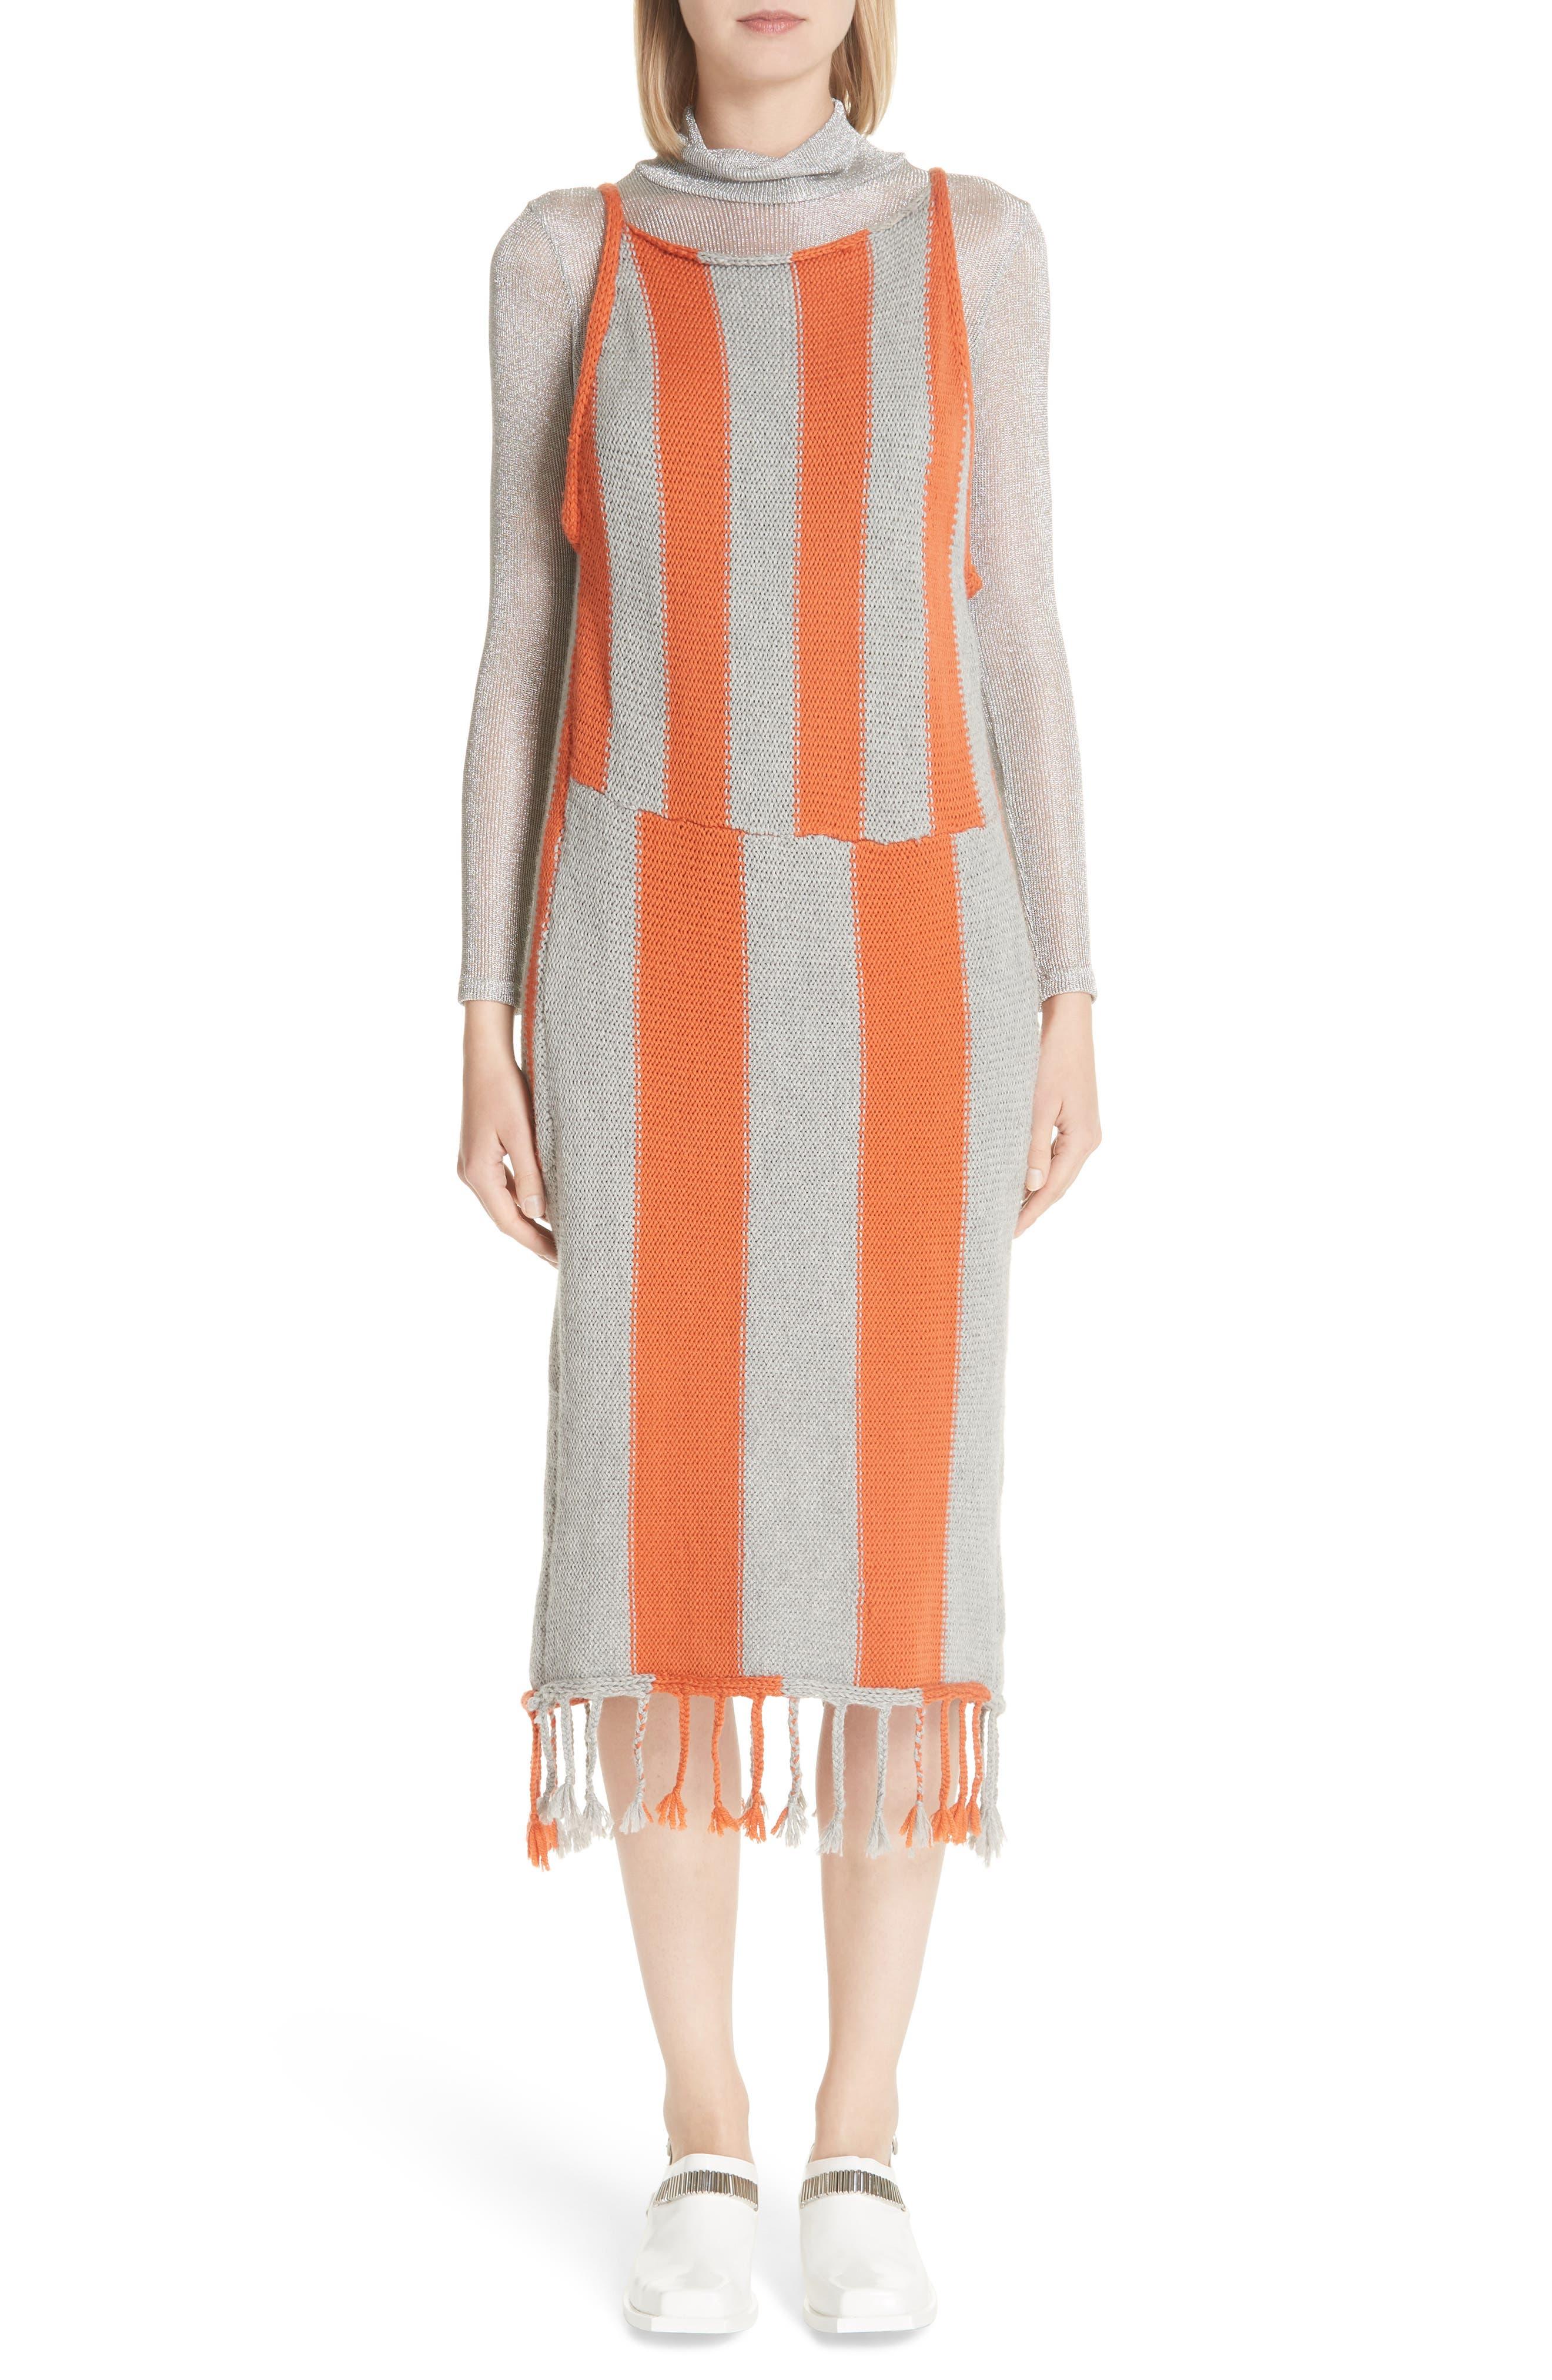 Metallic Rib Turtleneck Dress,                             Main thumbnail 1, color,                             SM - SILVER MESH